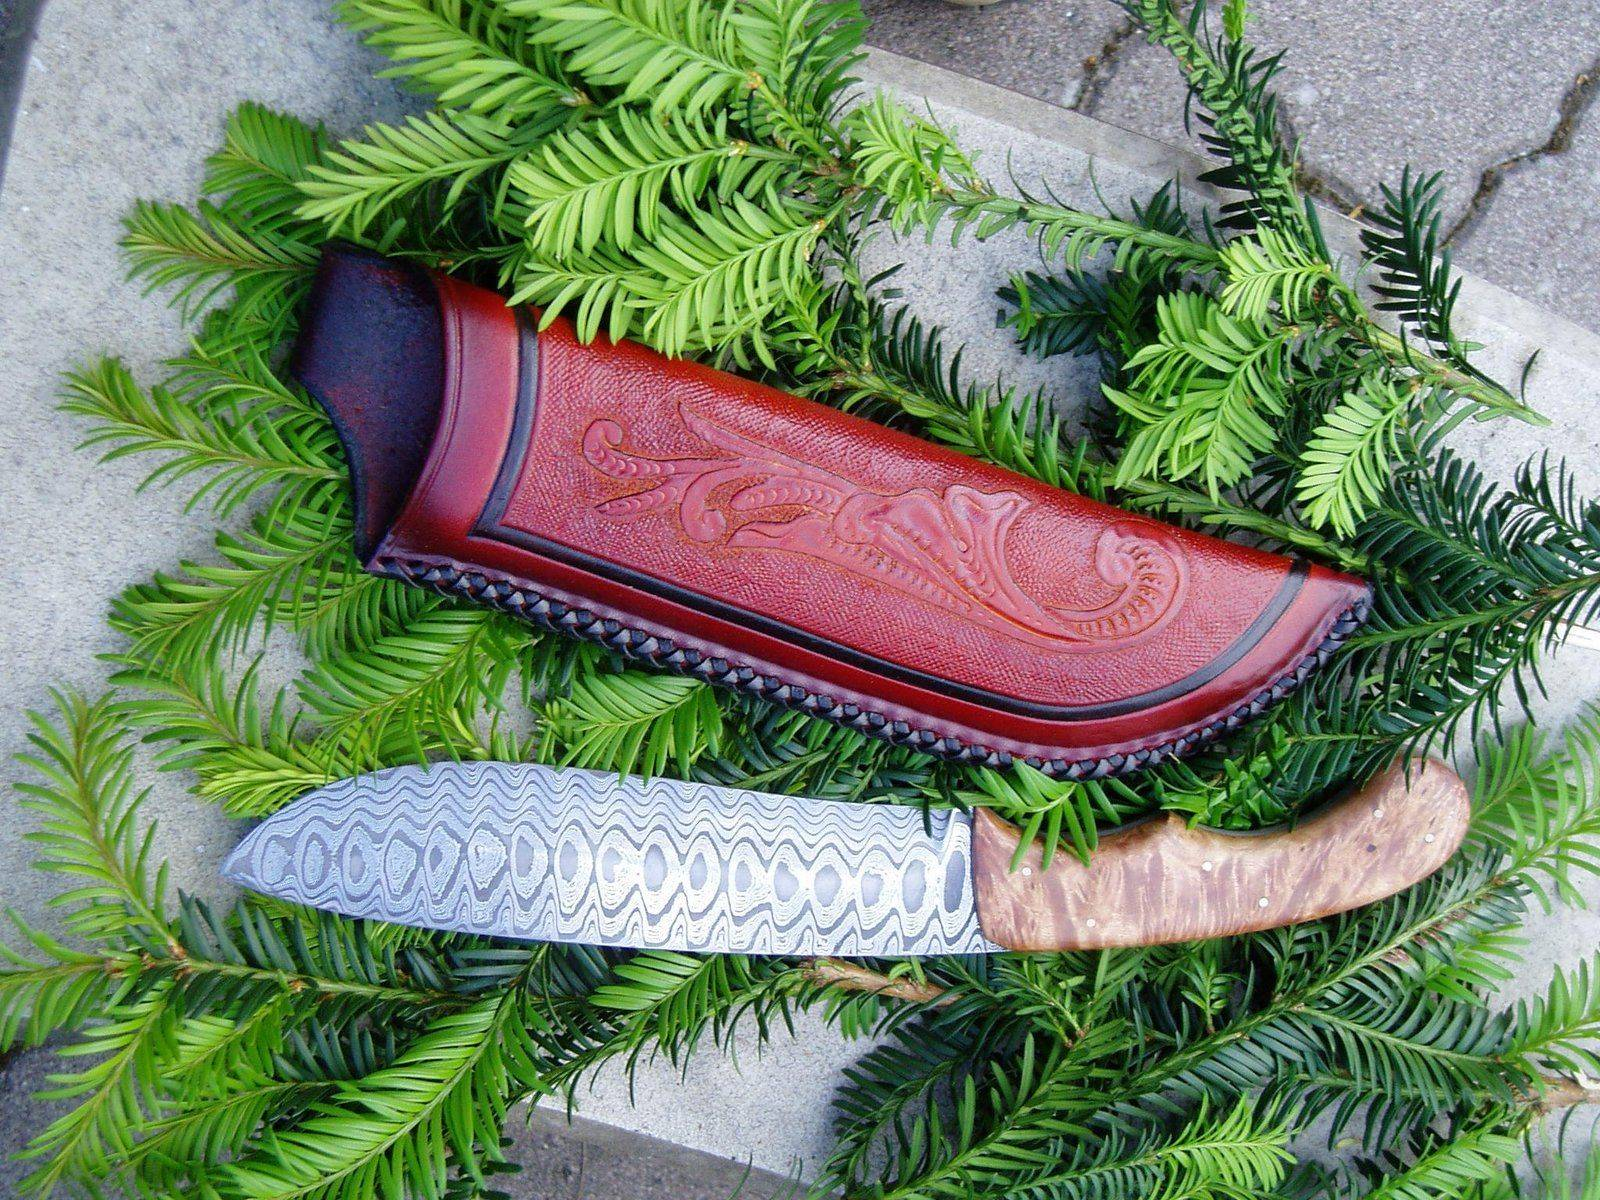 couteaux (79).JPG